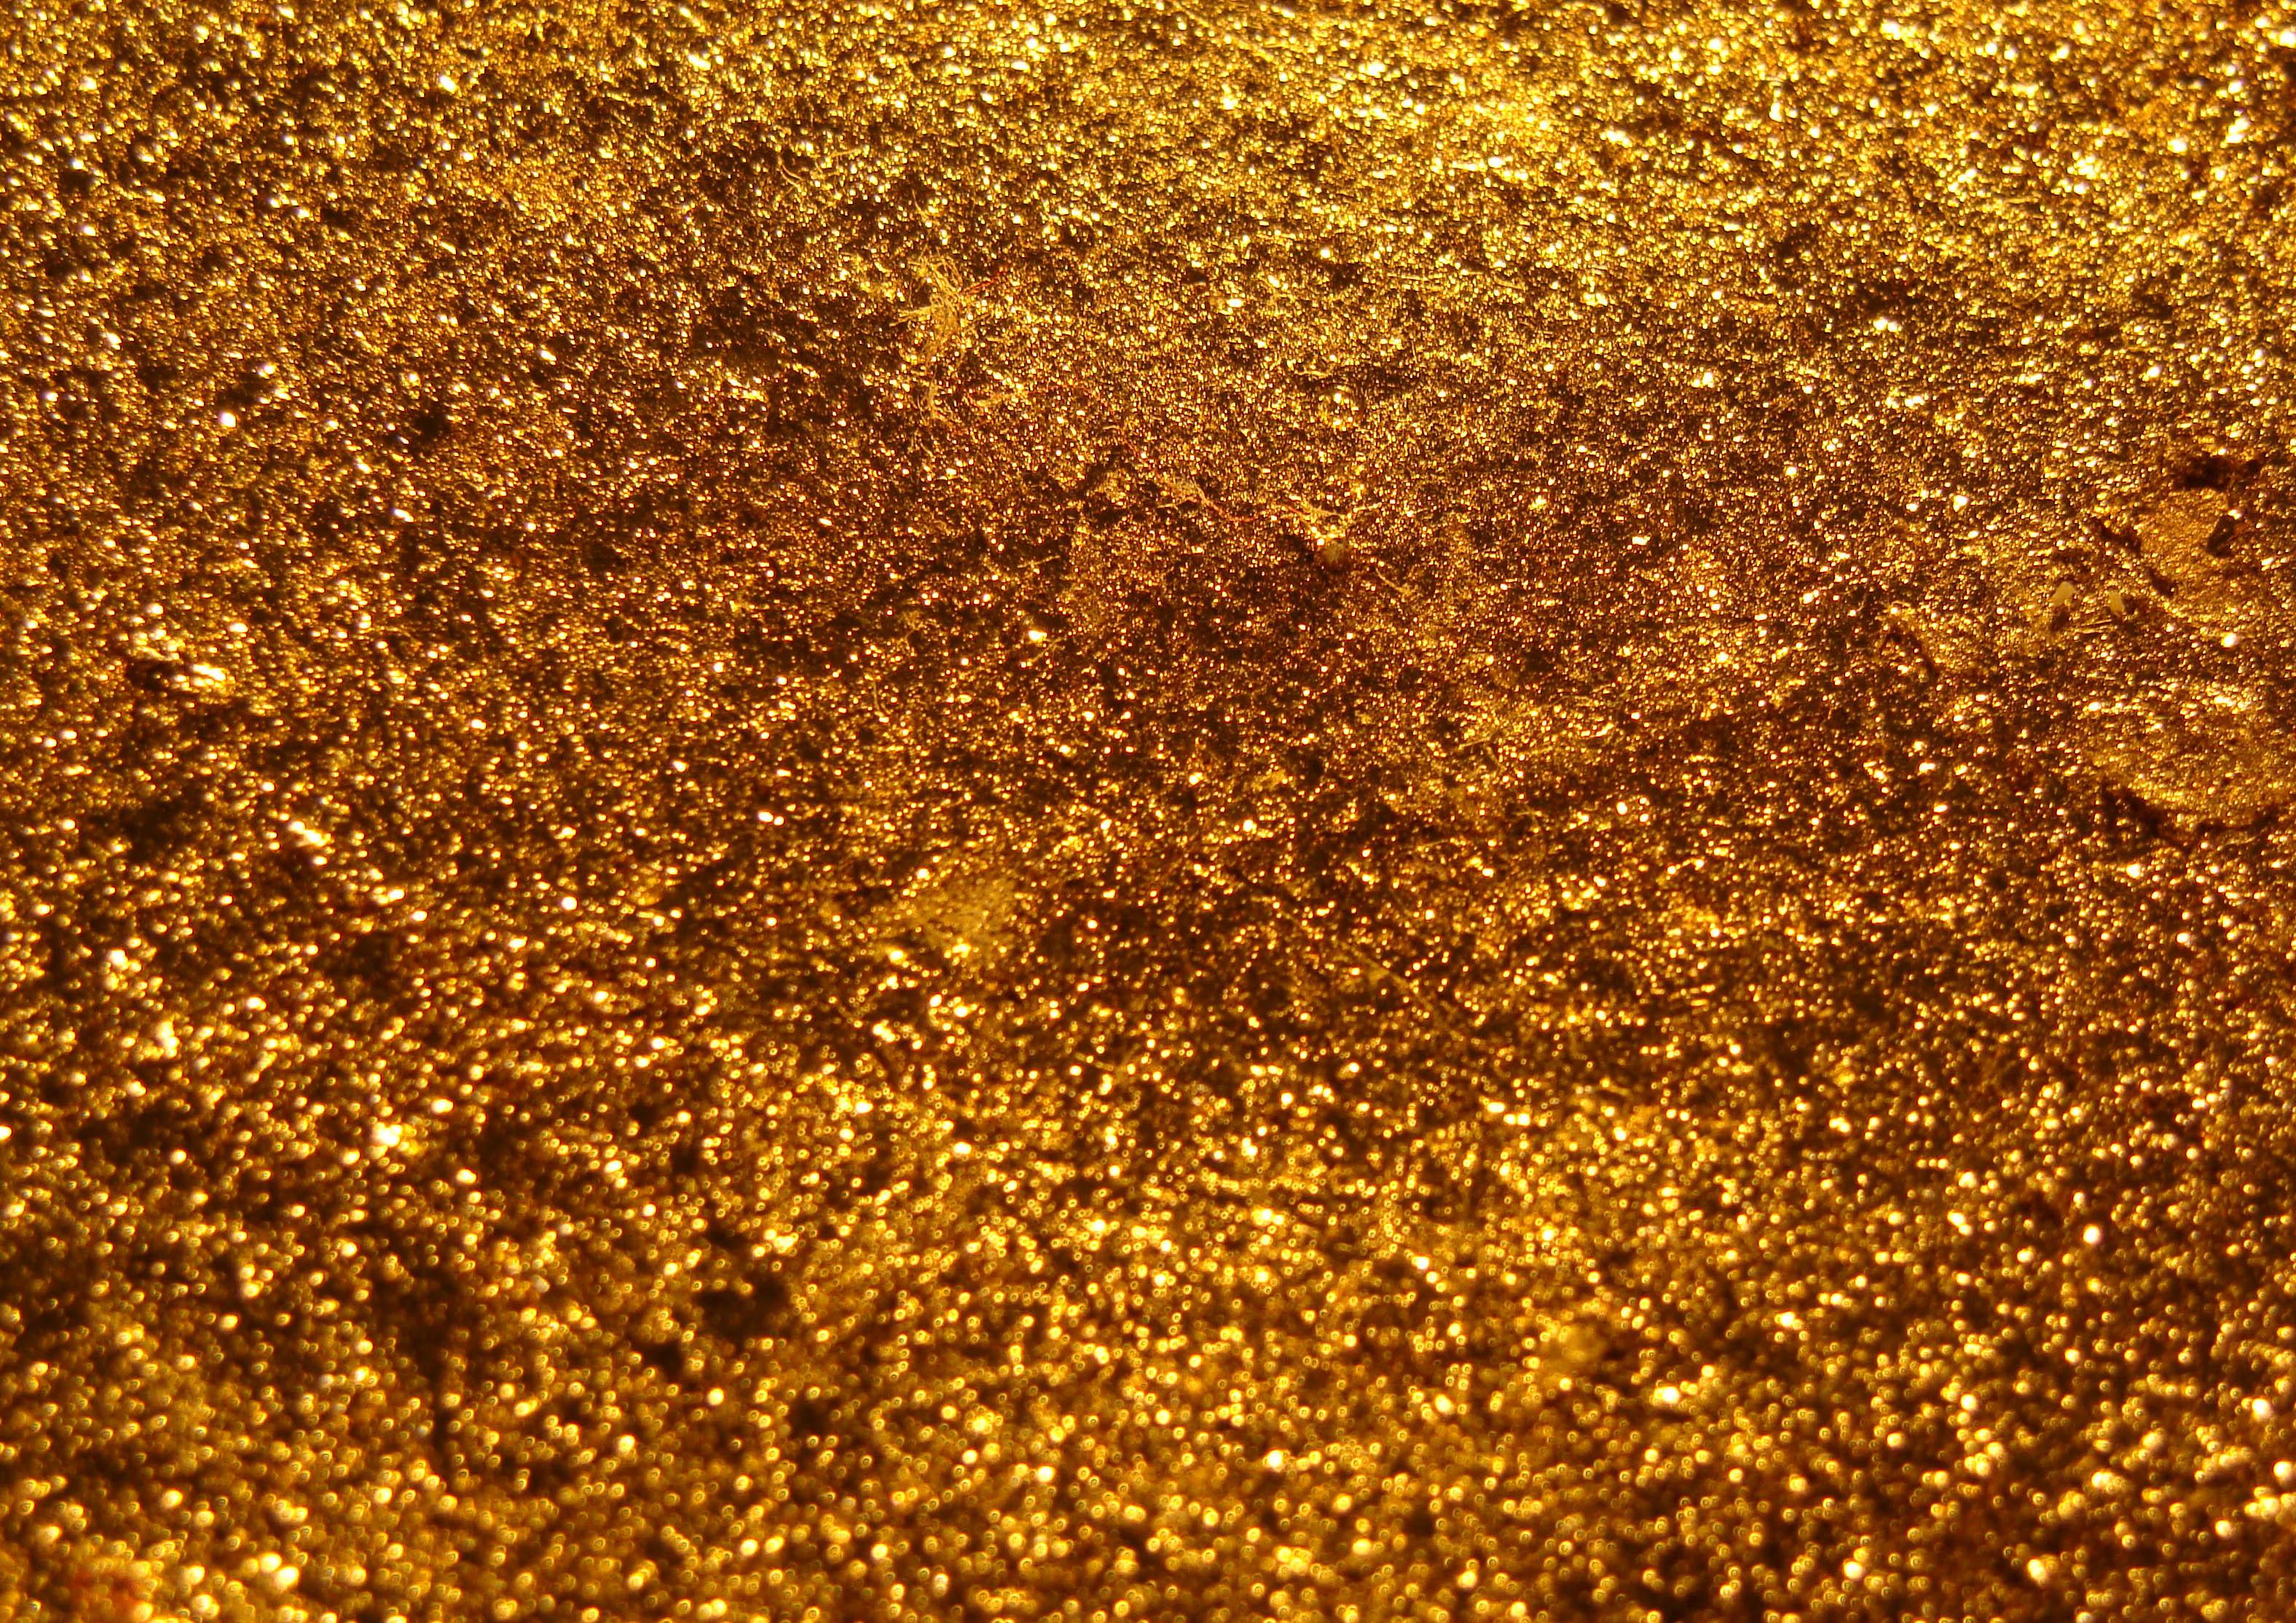 Gold glitter glow metal wealth wallpaper   ForWallpapercom 3152x2228